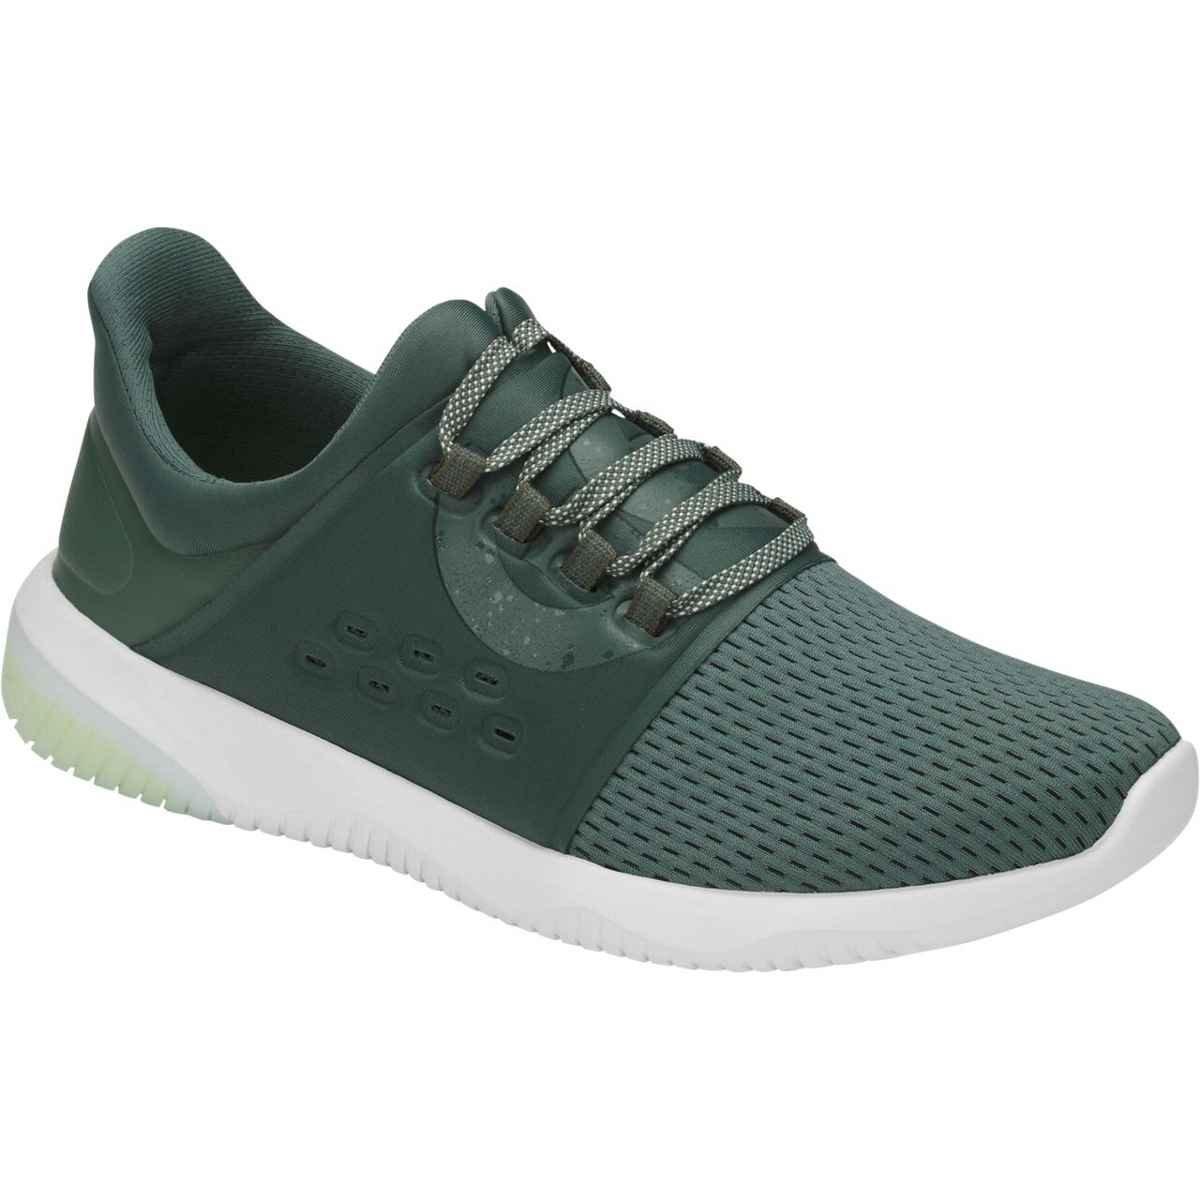 ASICS Gel-Kenun Lyte Running Shoe - Men's B071Z8VYF8 10 D(M) US|Dark Forest/Four Leaf Clover/Patina Green